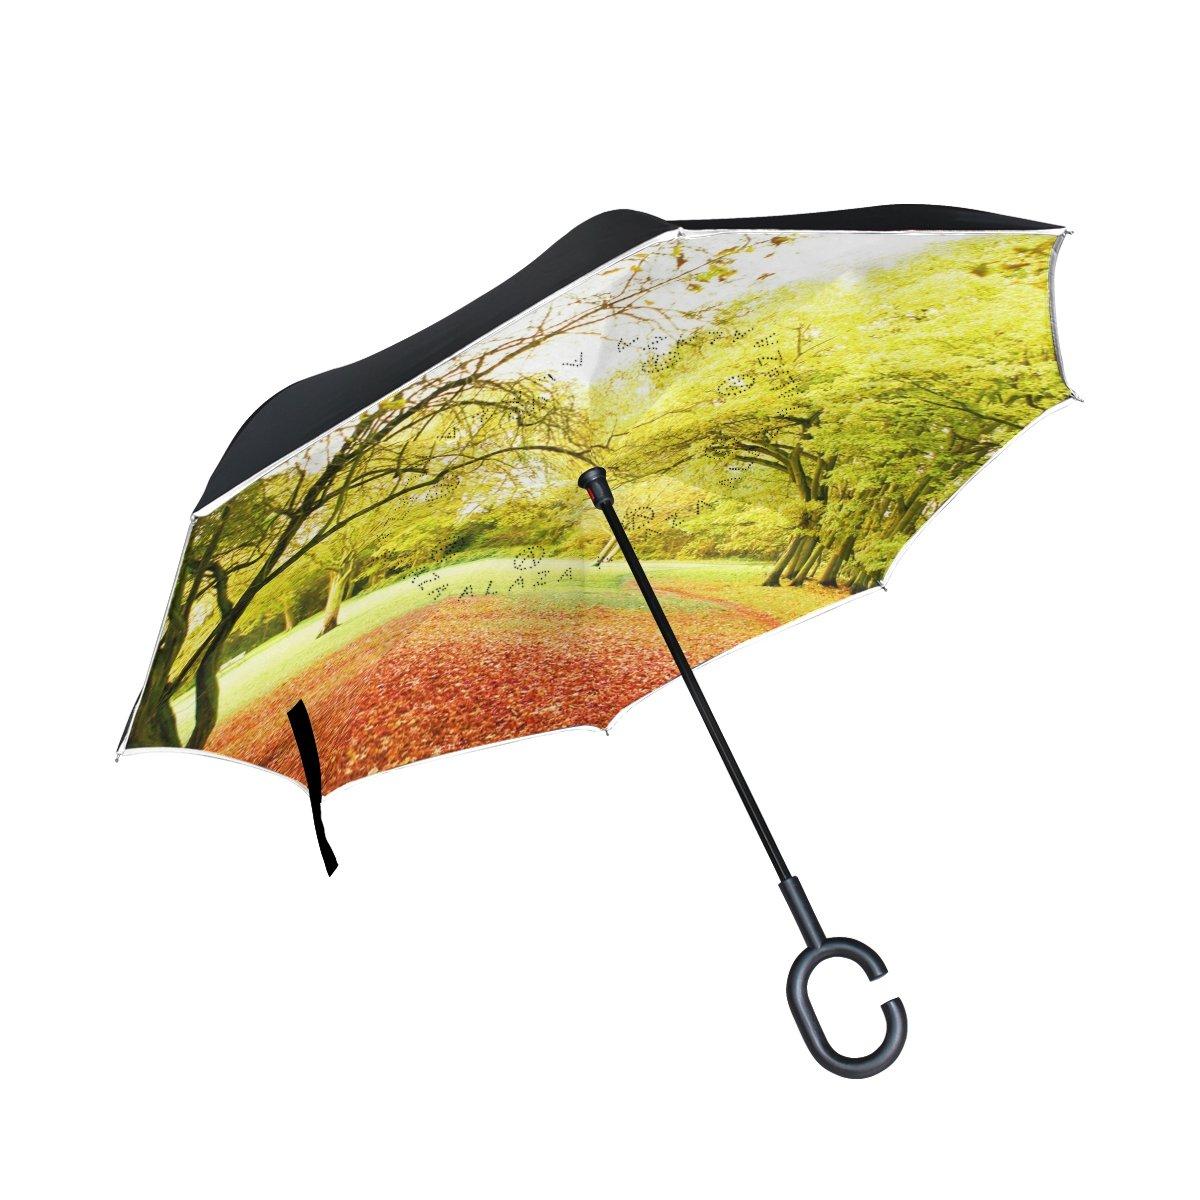 xianghefu Double Layer Inverted Reverse Umbrellas秋景色公園風景ツリー折りたたみ防風UV保護Big Straight for Car C型のハンドル   B07FCQMNVK